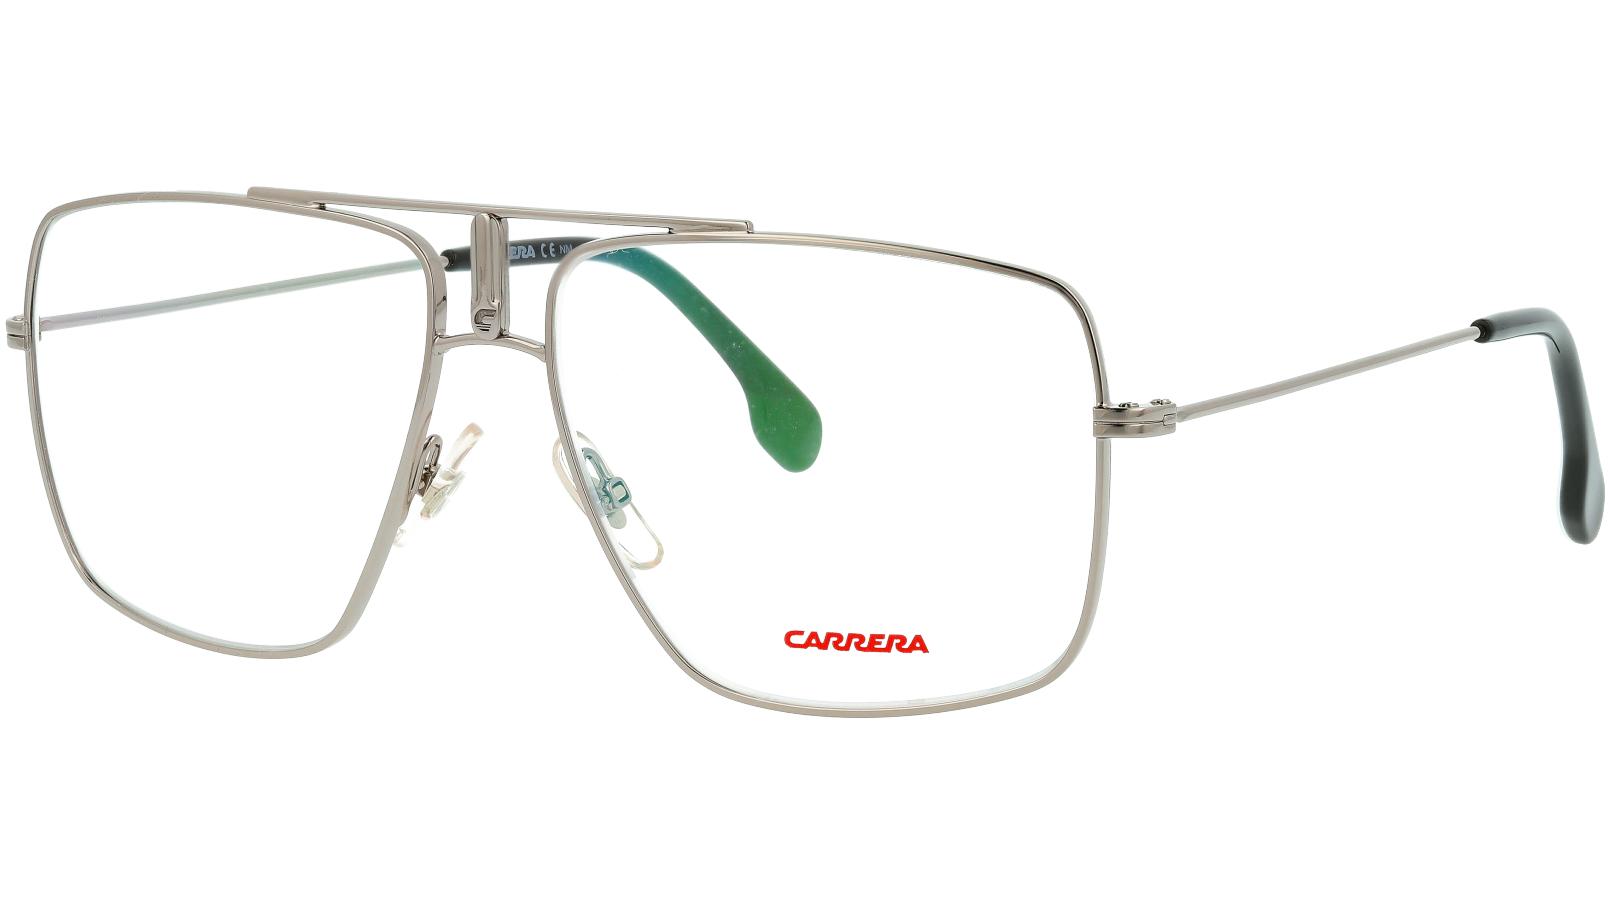 Carrera 1108 6LB 58 Ruthenium Glasses